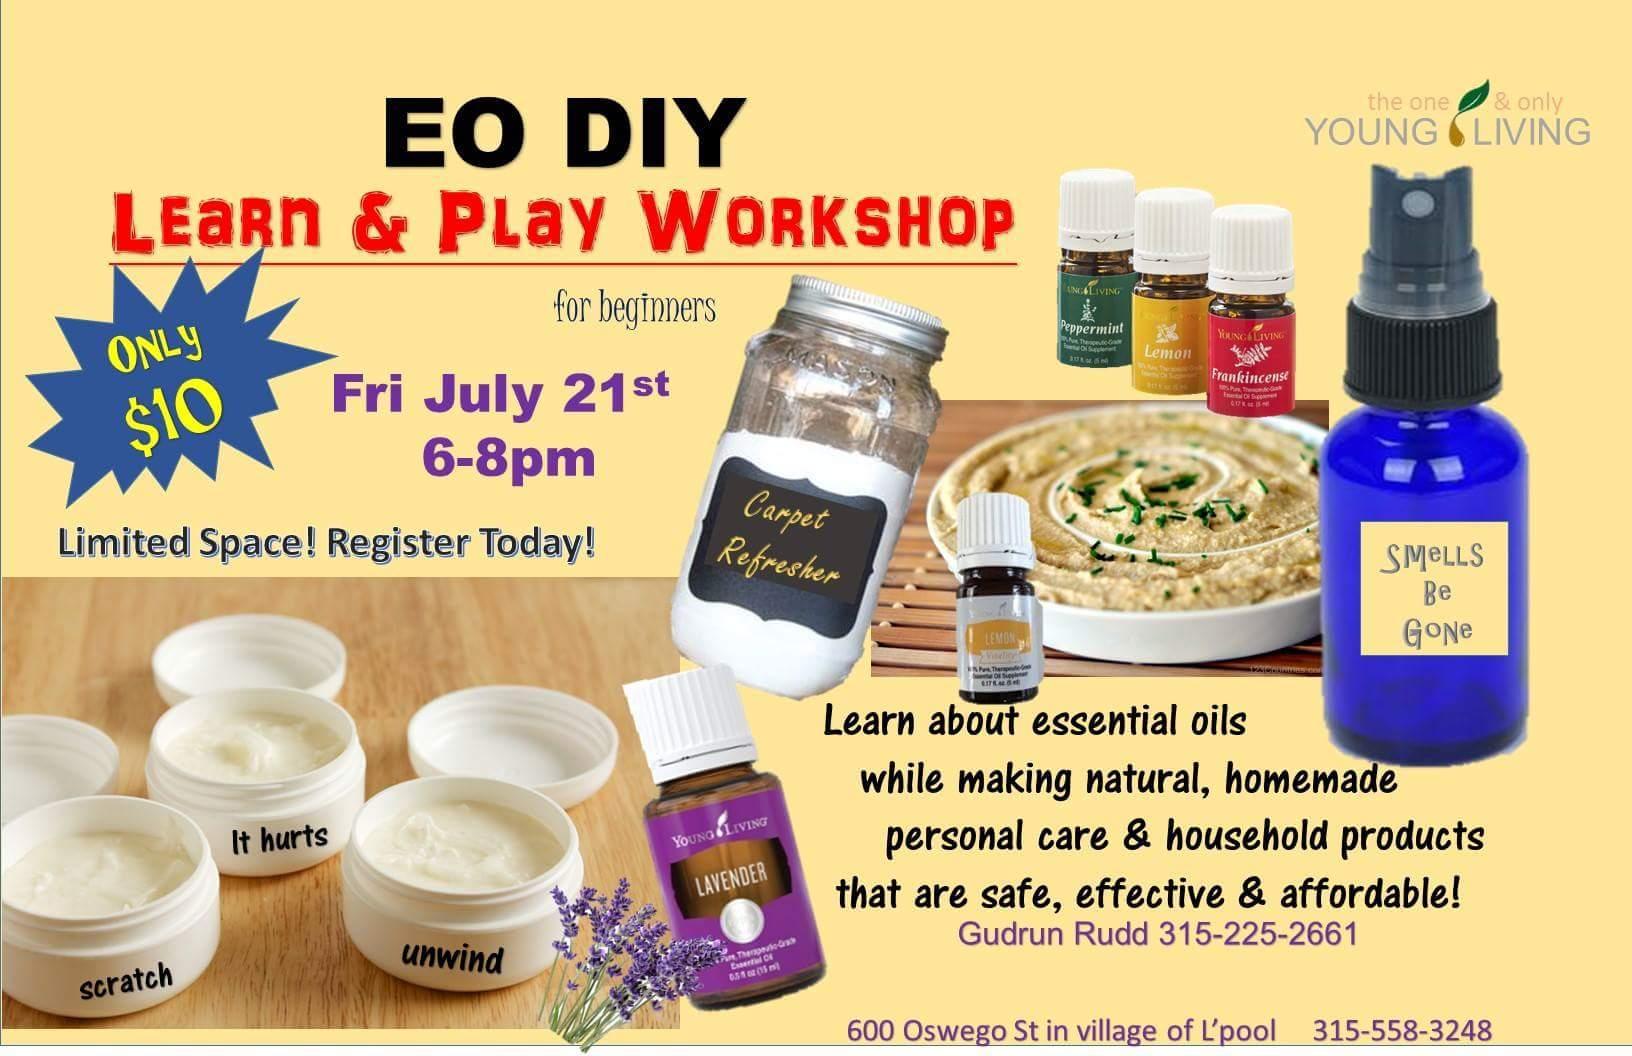 EO DIY Learn & Play Workshop